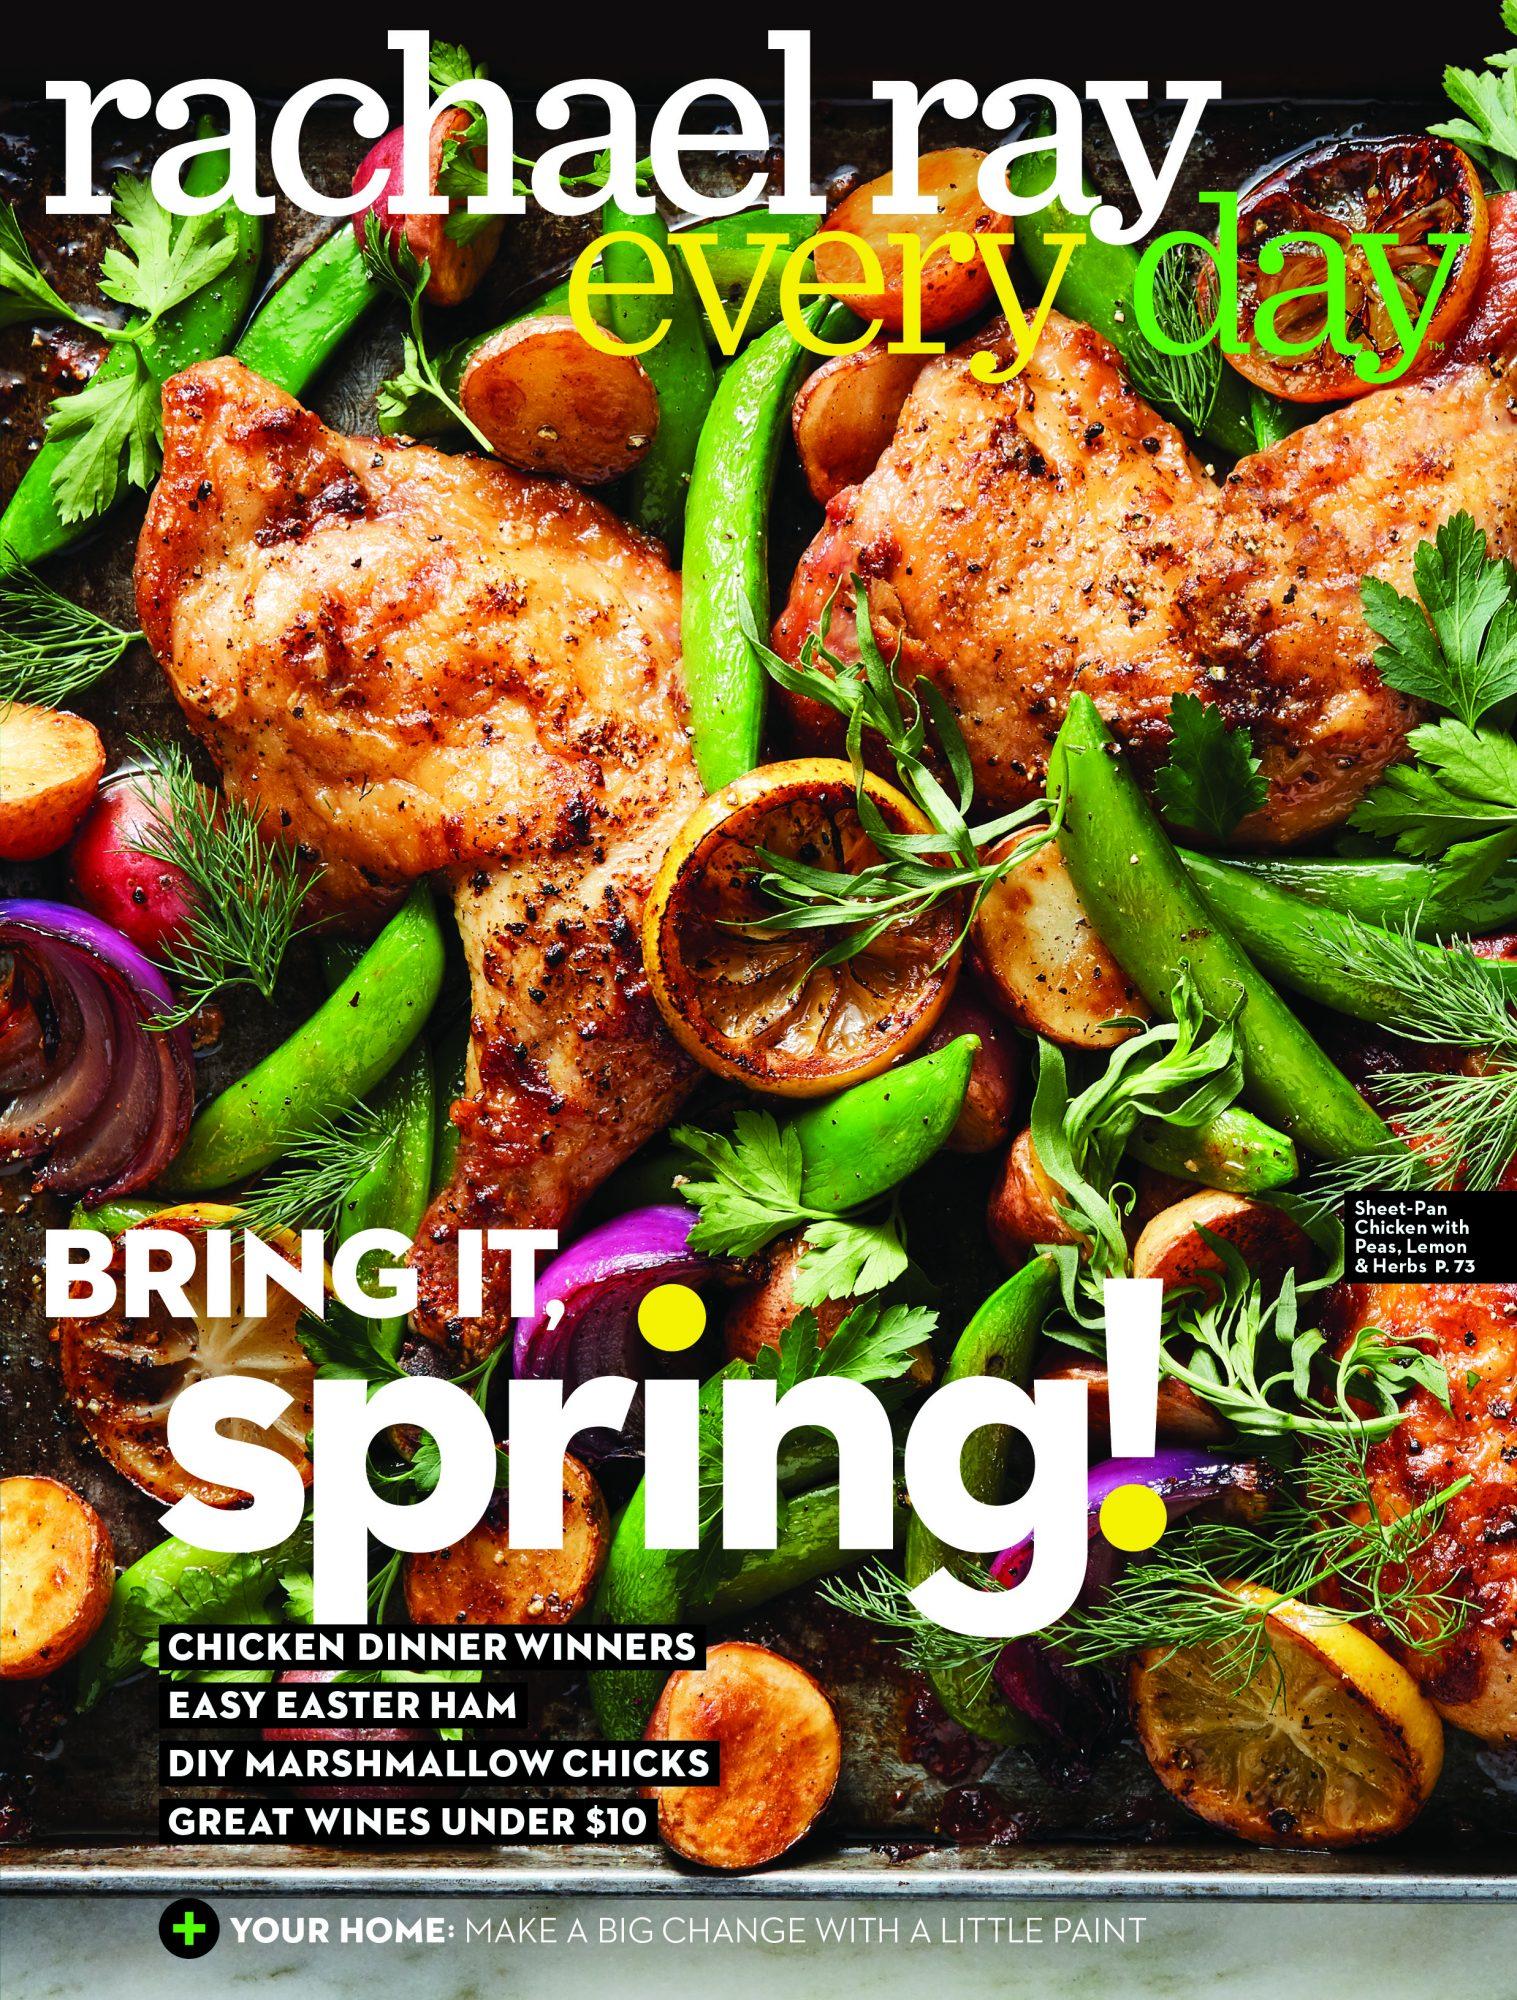 April 2018 cover - sheet-pan chicken